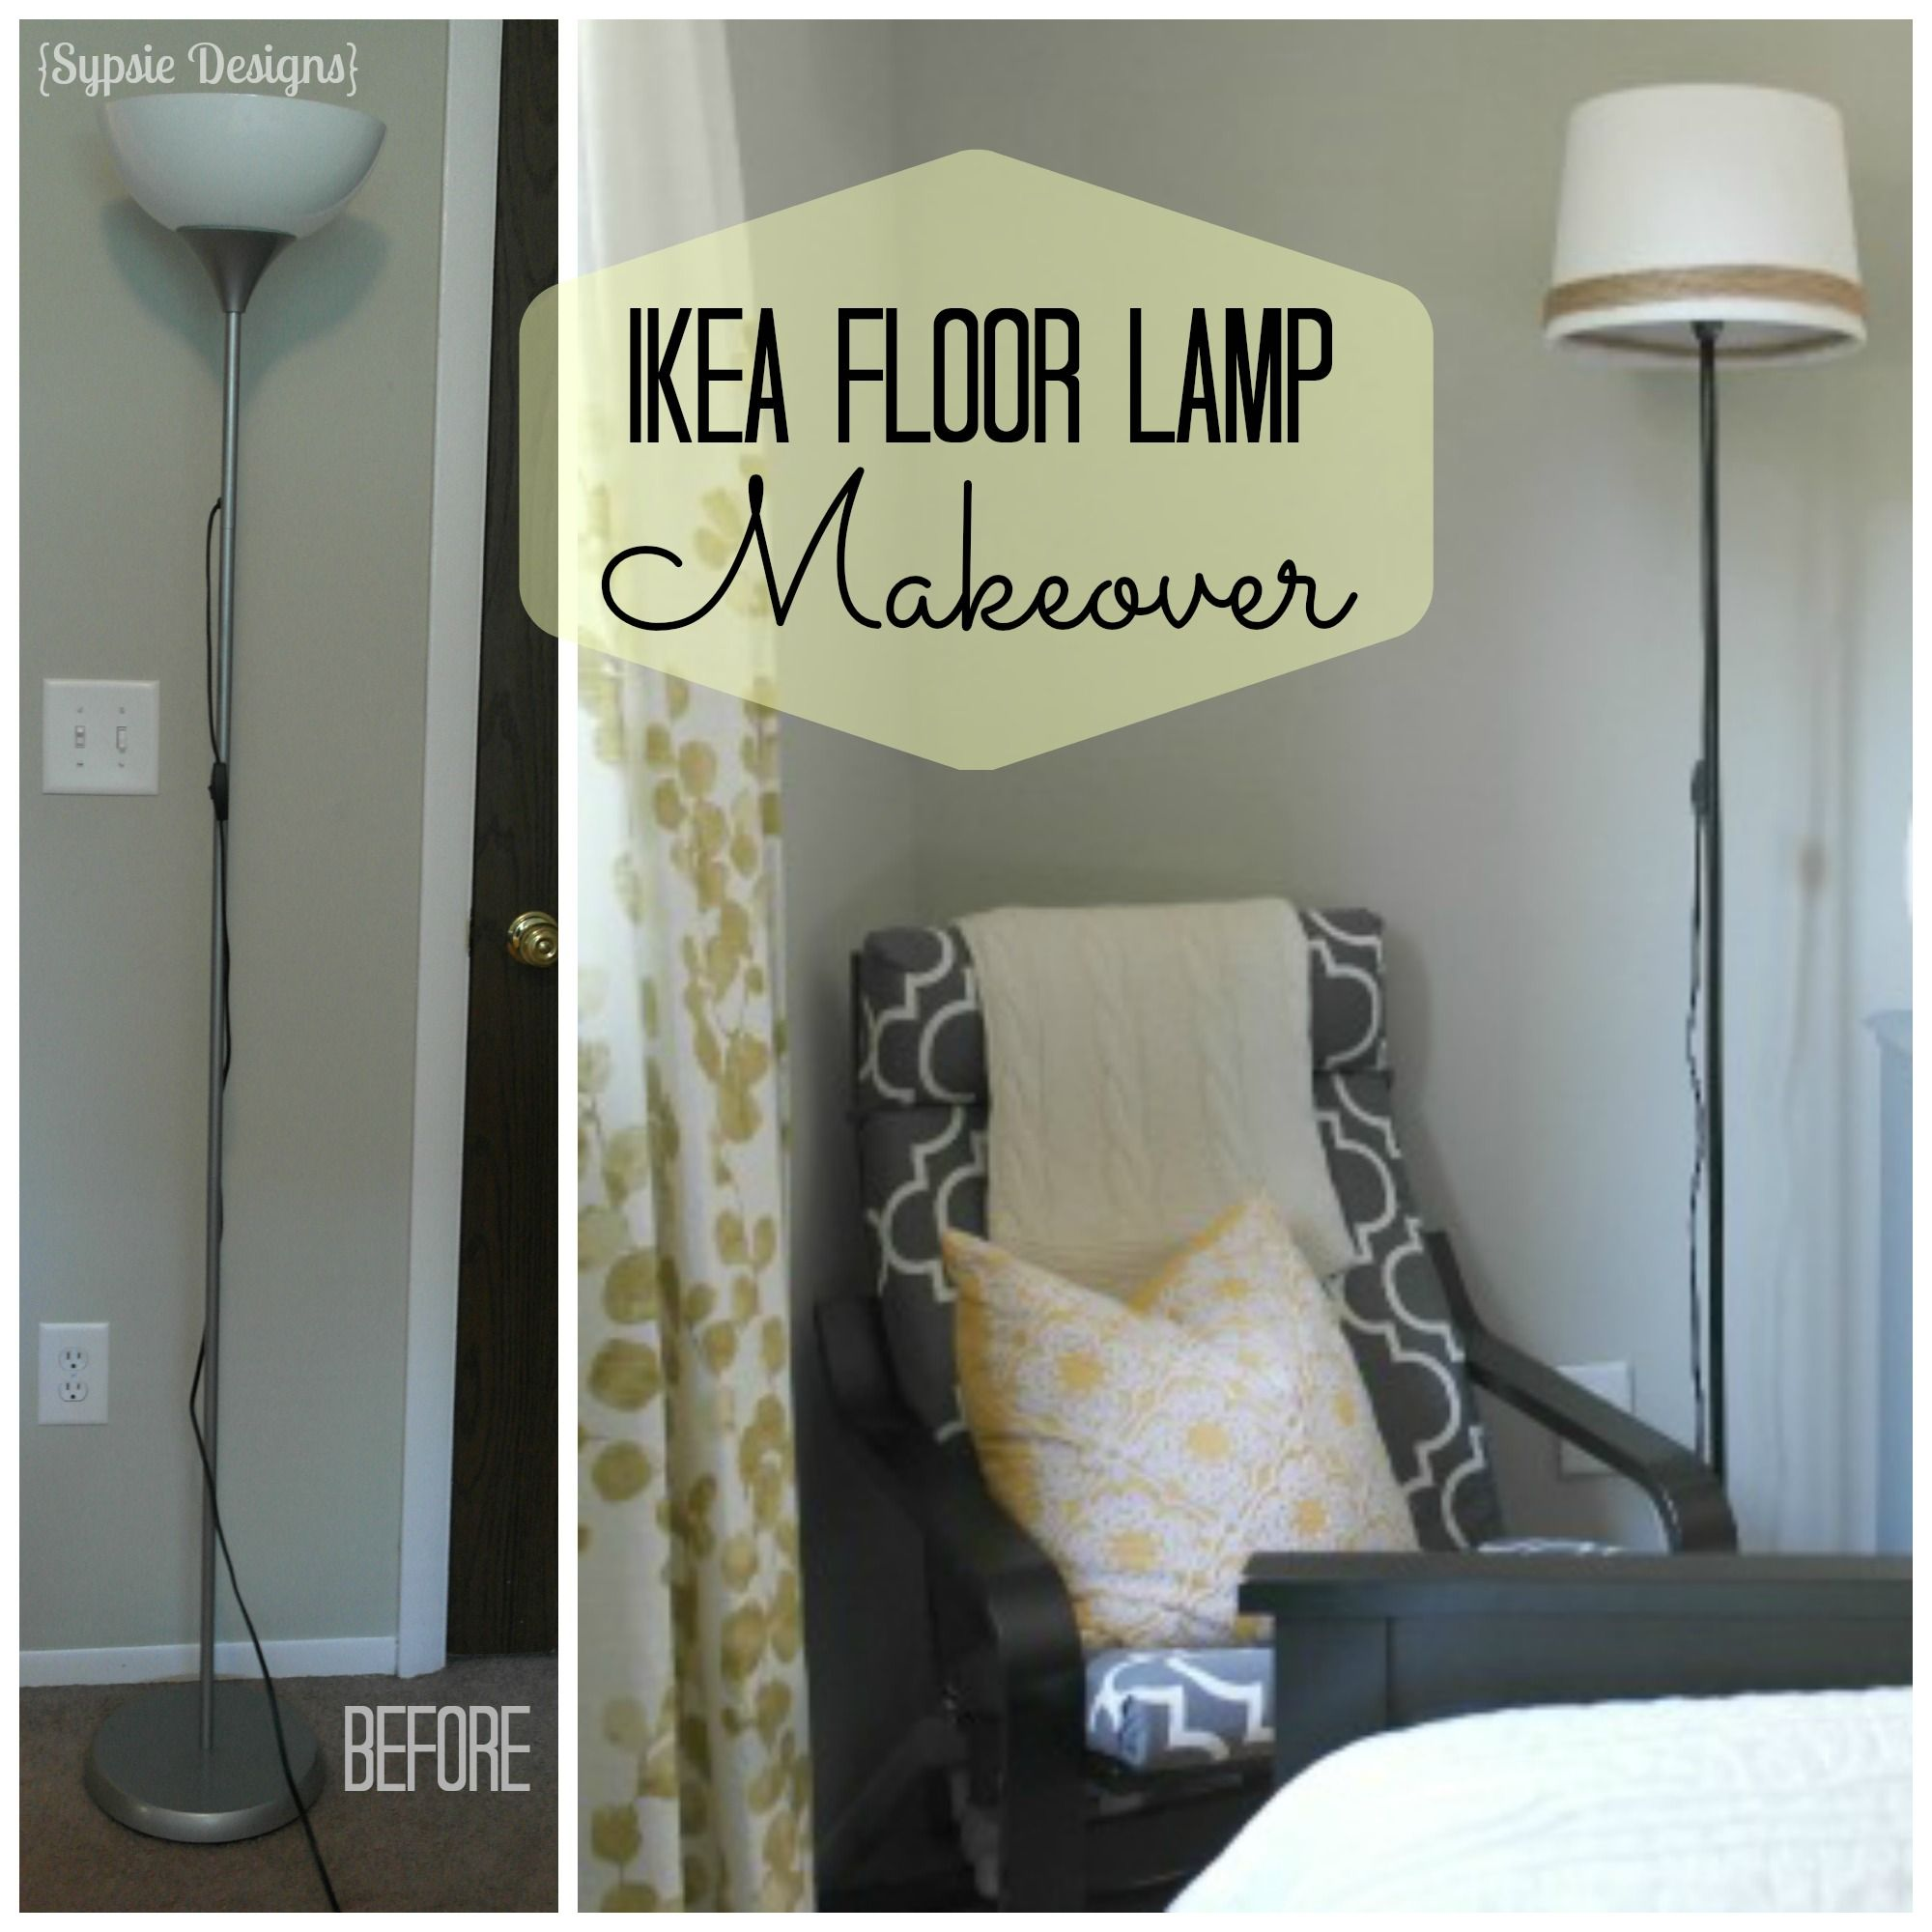 IKEA NOT Floor Lamp Makeover - Sypsie Designs | DIY | Pinterest ... for Diy Floor Lamp Makeover  117dqh